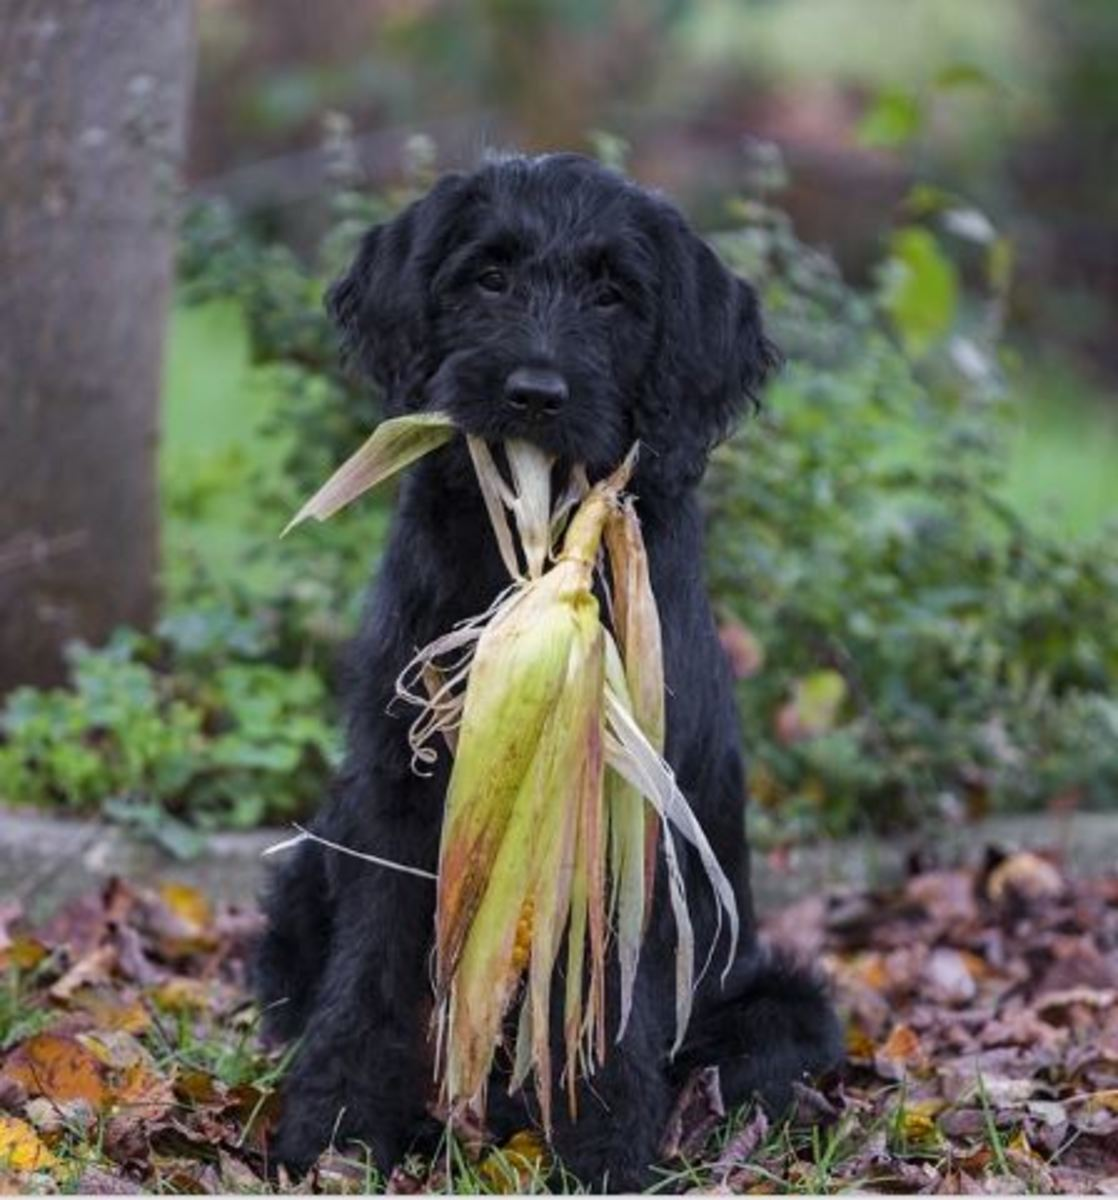 Help, my dog swallowed a corn cob